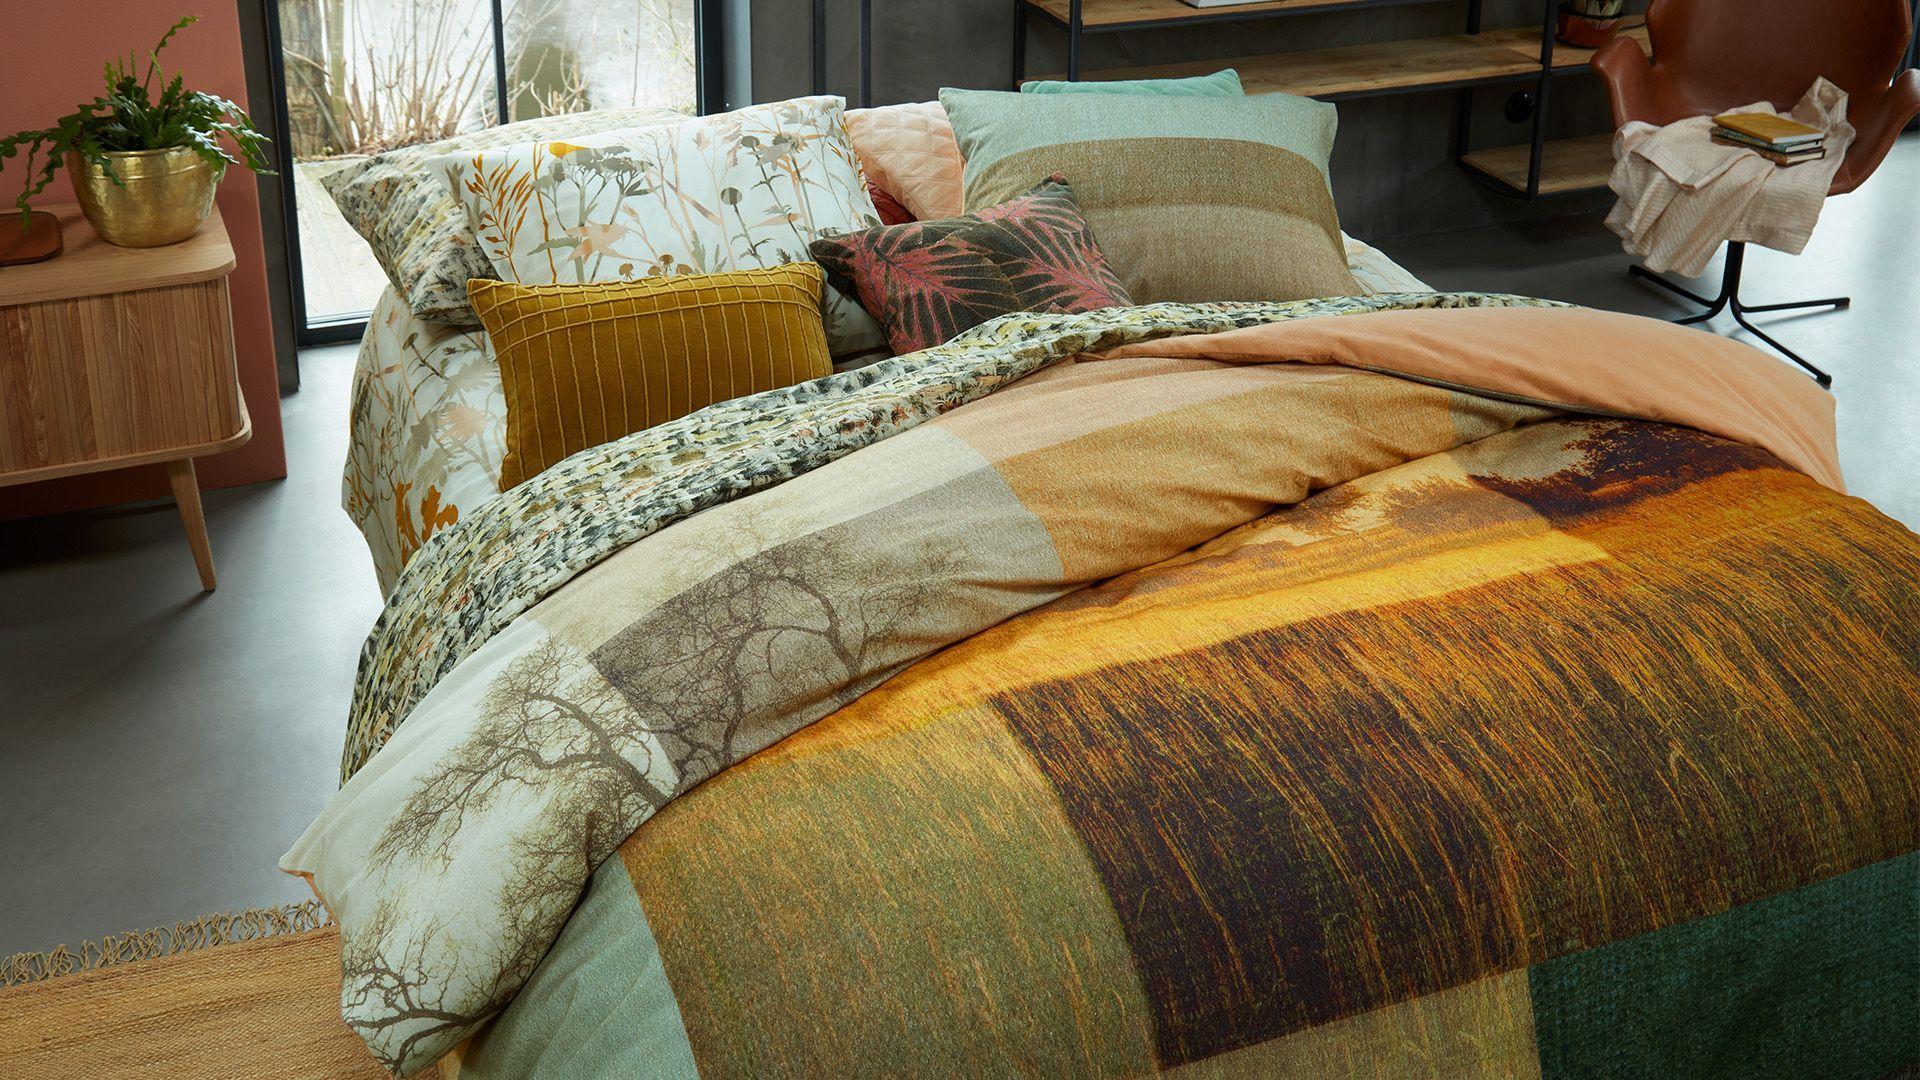 Beddinghouse storybed Autumn Glory